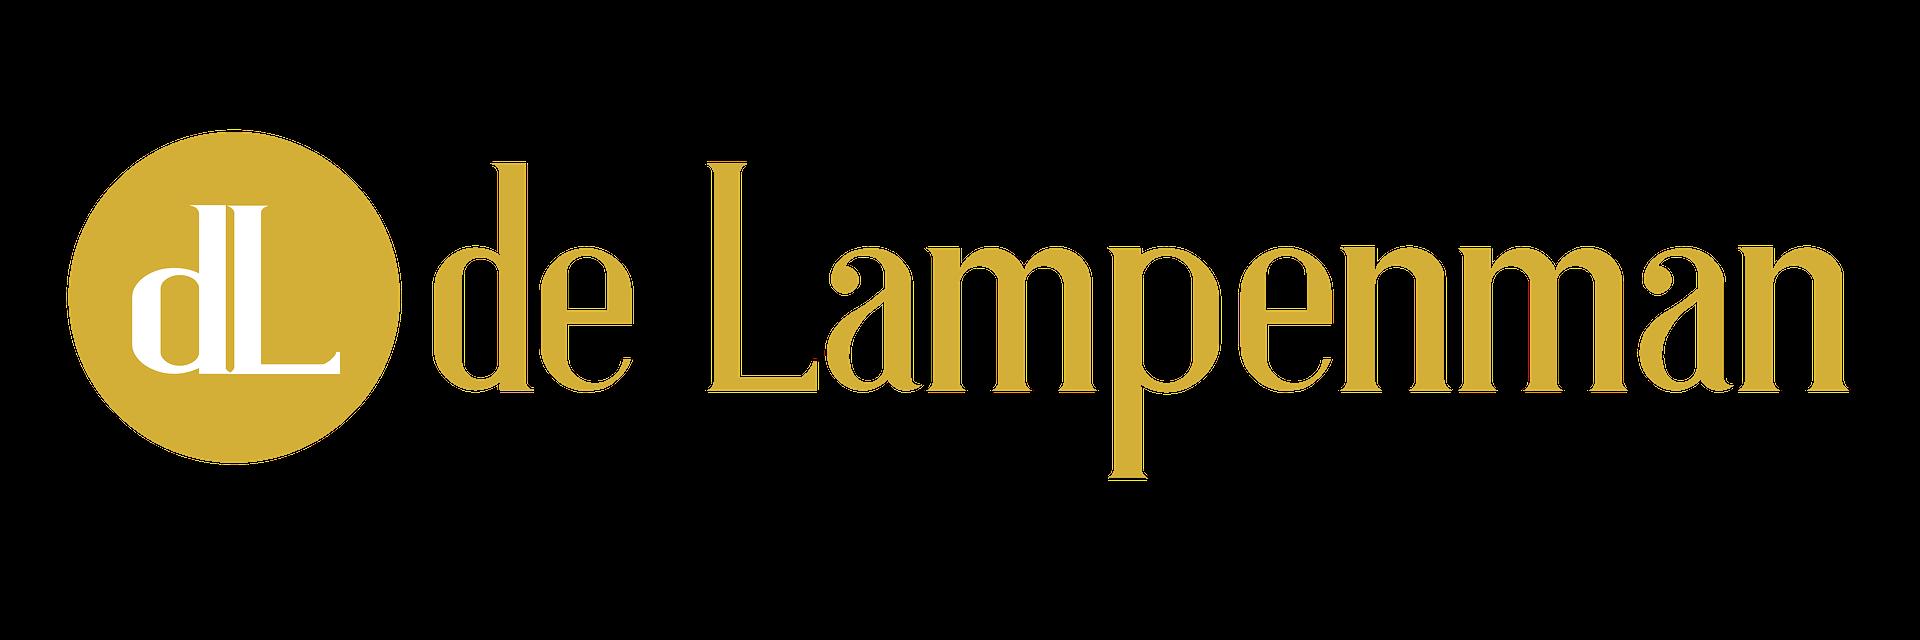 de Lampenman